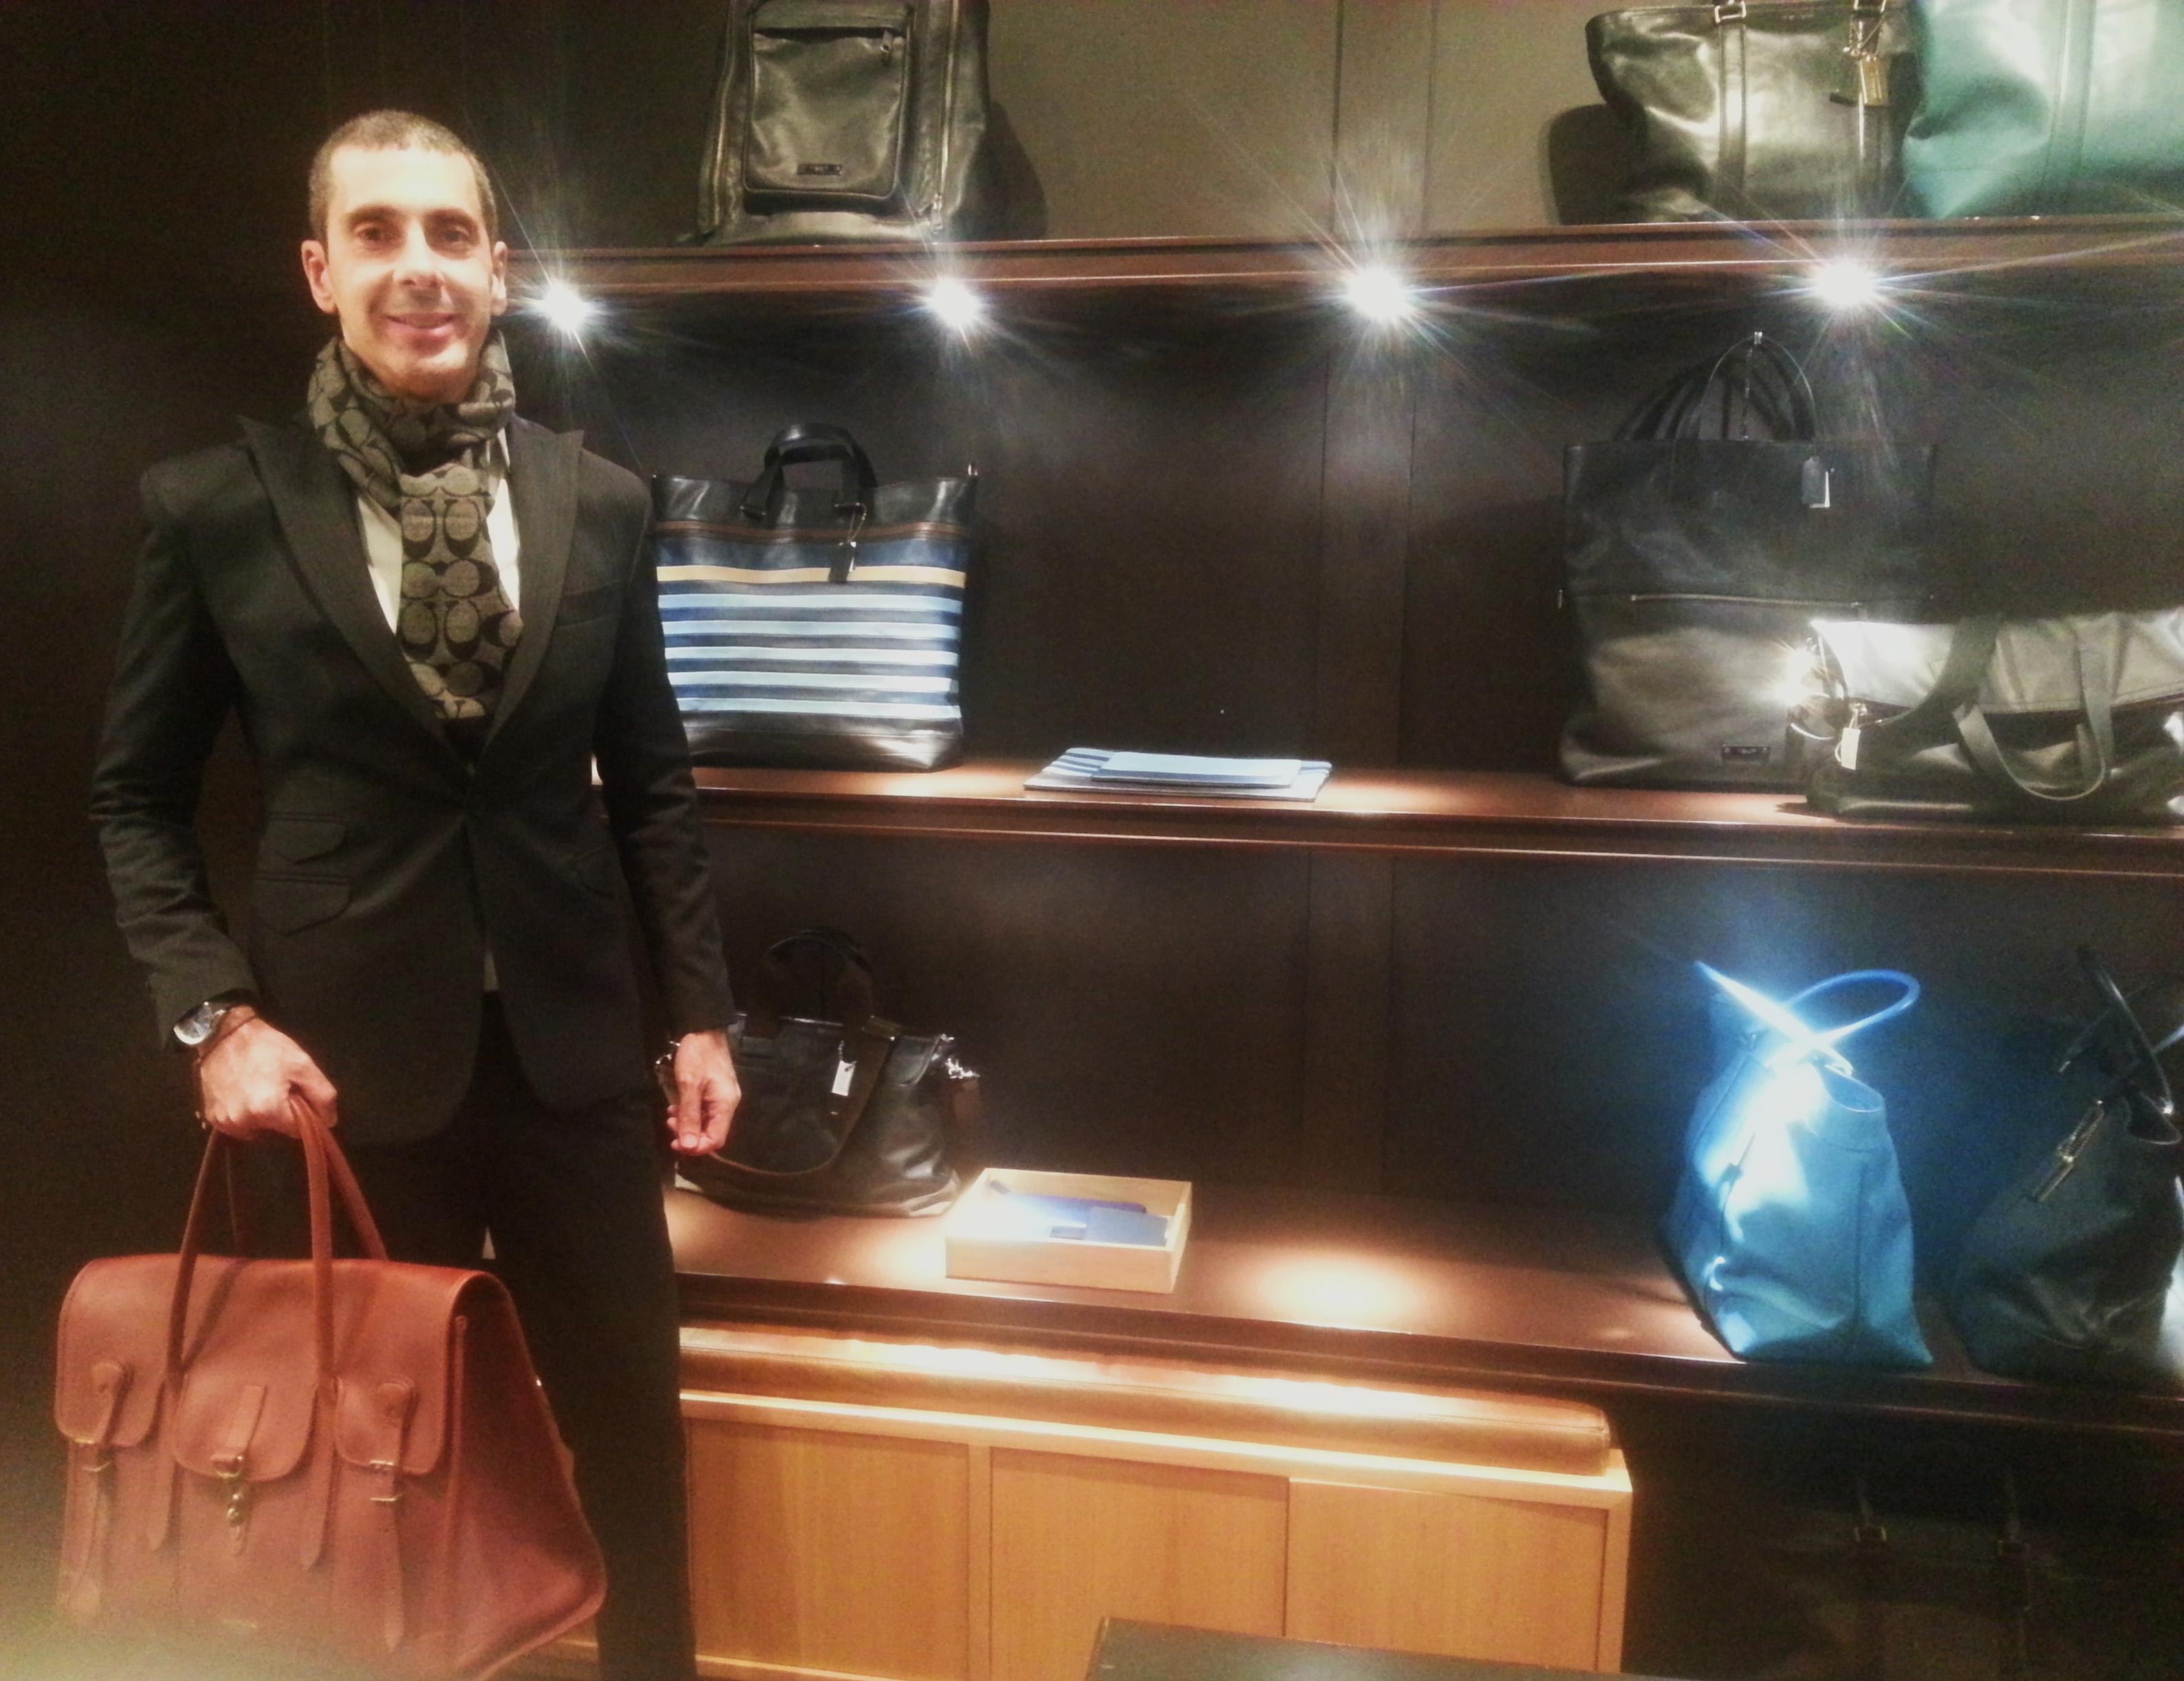 colecao-inverno-2014-coach-jk-iguatemi-alexandre-taleb (8)